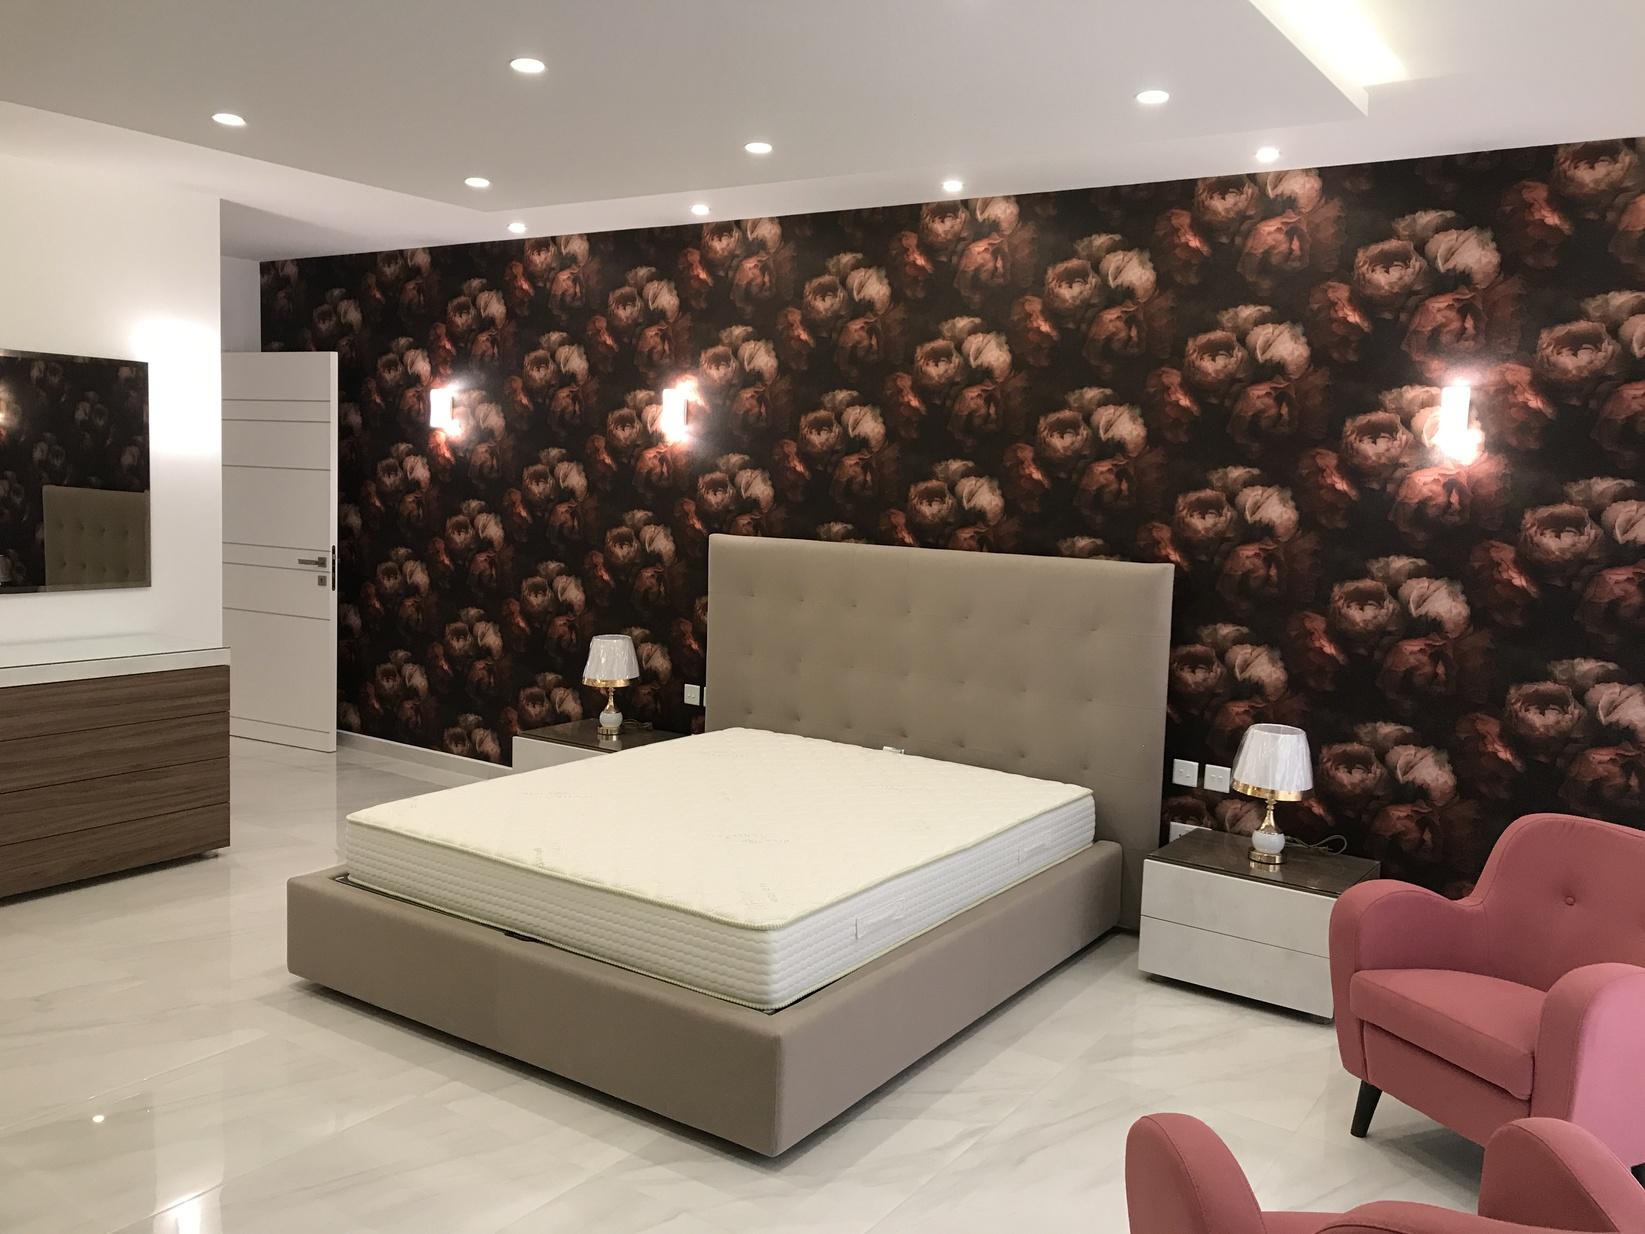 3 bed Apartment For Rent in Qawra, Qawra - thumb 24